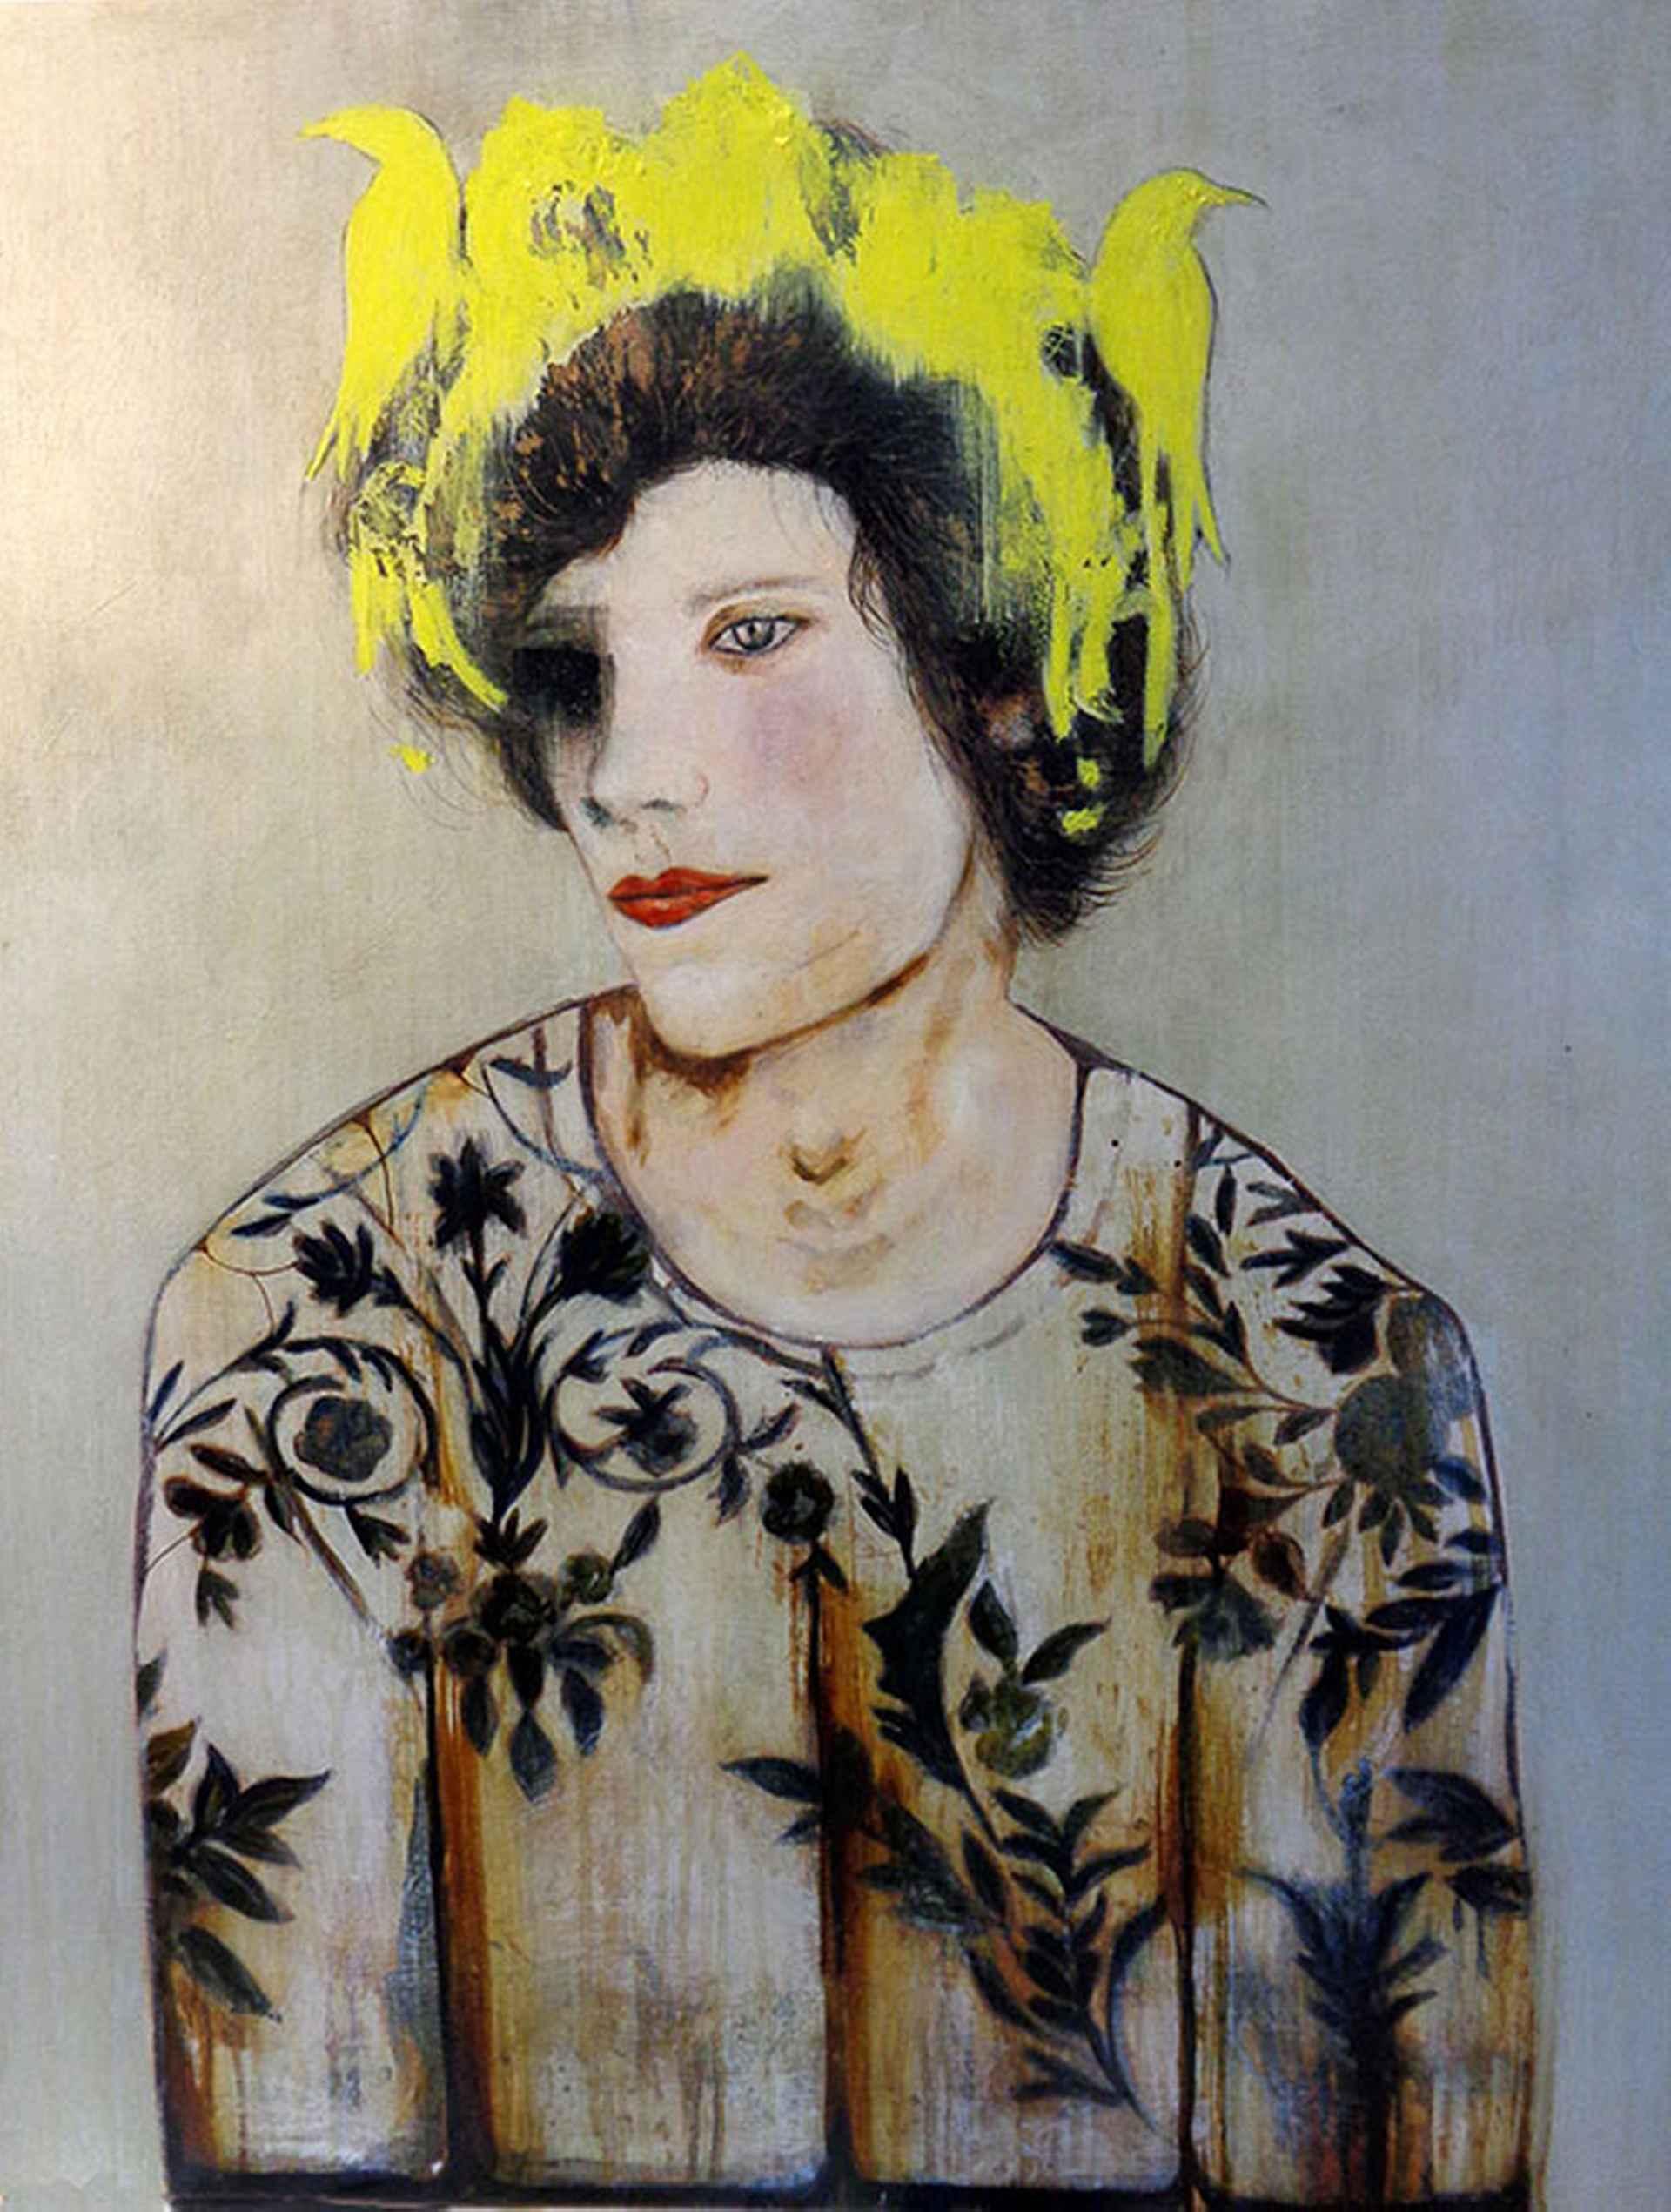 The Body Fluctuation II by Karenina Fabrizzi